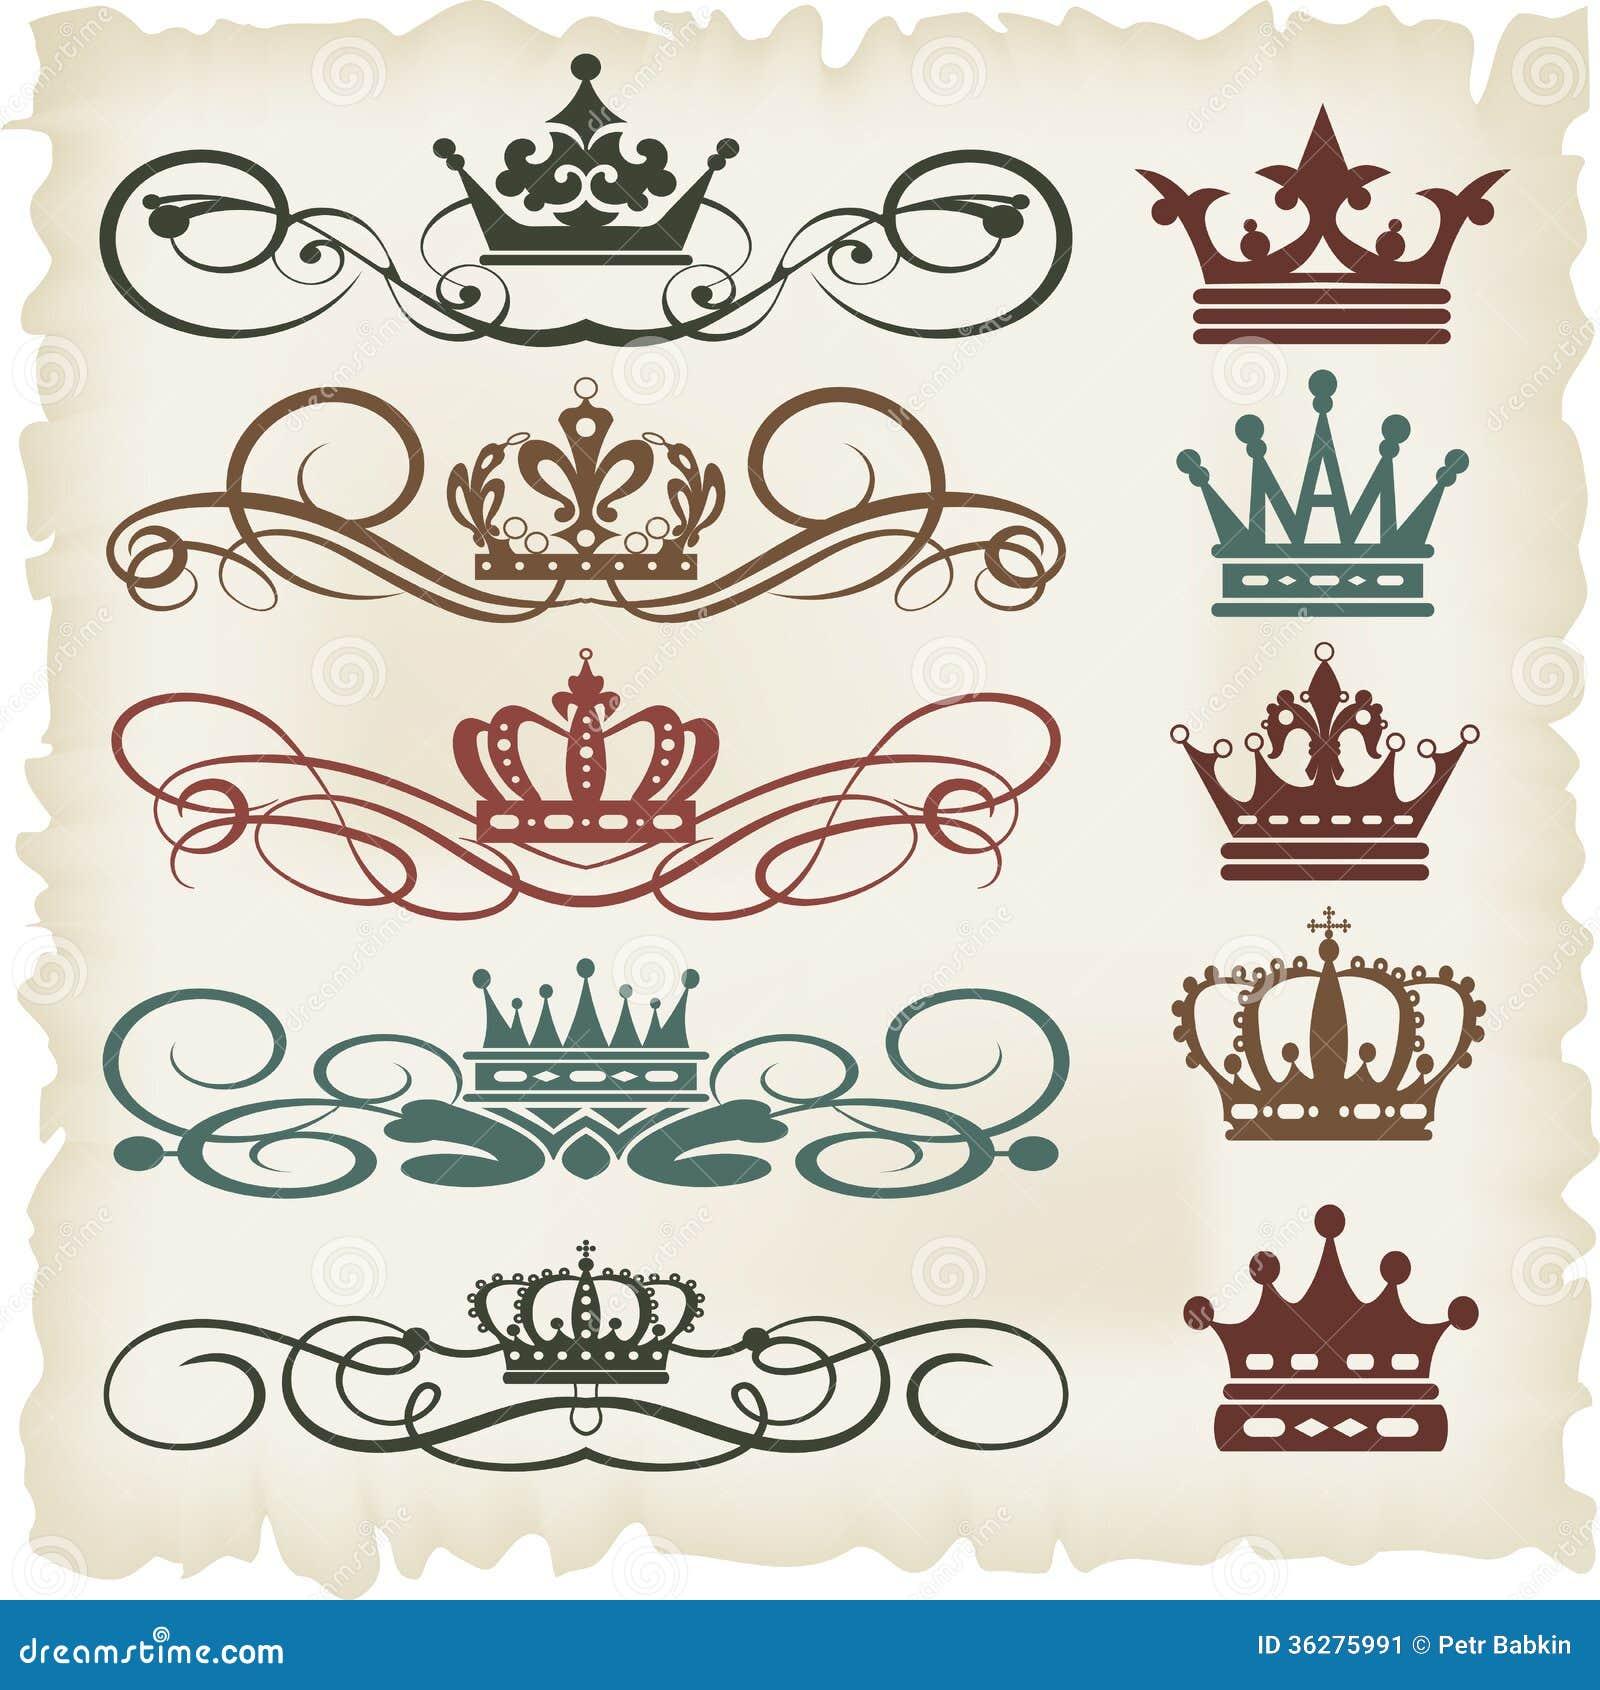 Free Calligraphic Design Elements